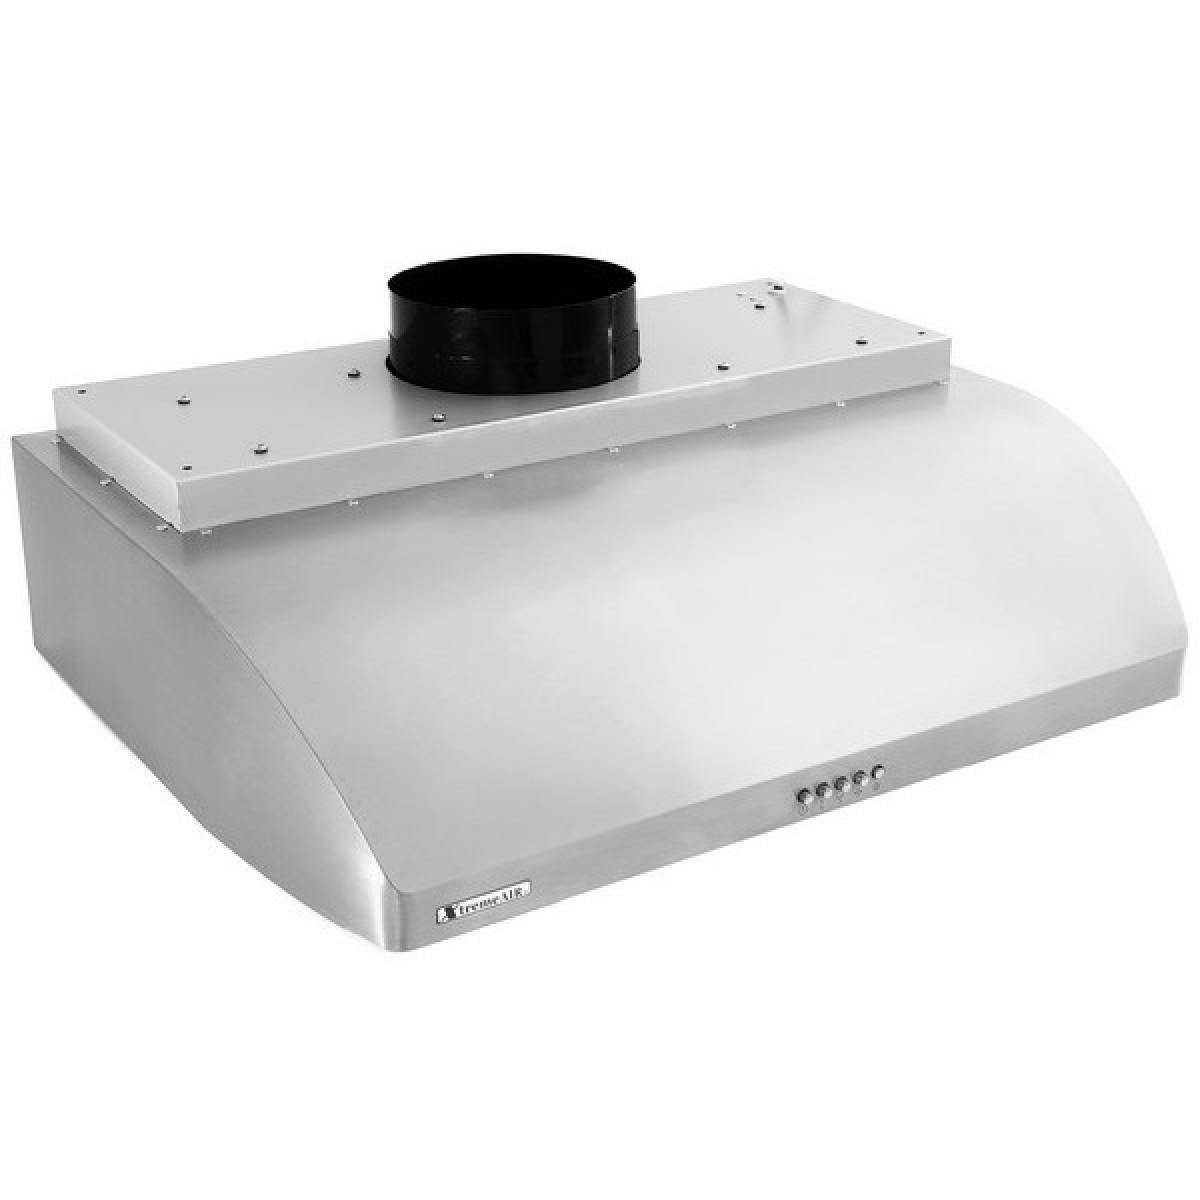 xtremeair 30 inch under cabinet stainless steel range hood ul14 u30 cfm 900. Black Bedroom Furniture Sets. Home Design Ideas